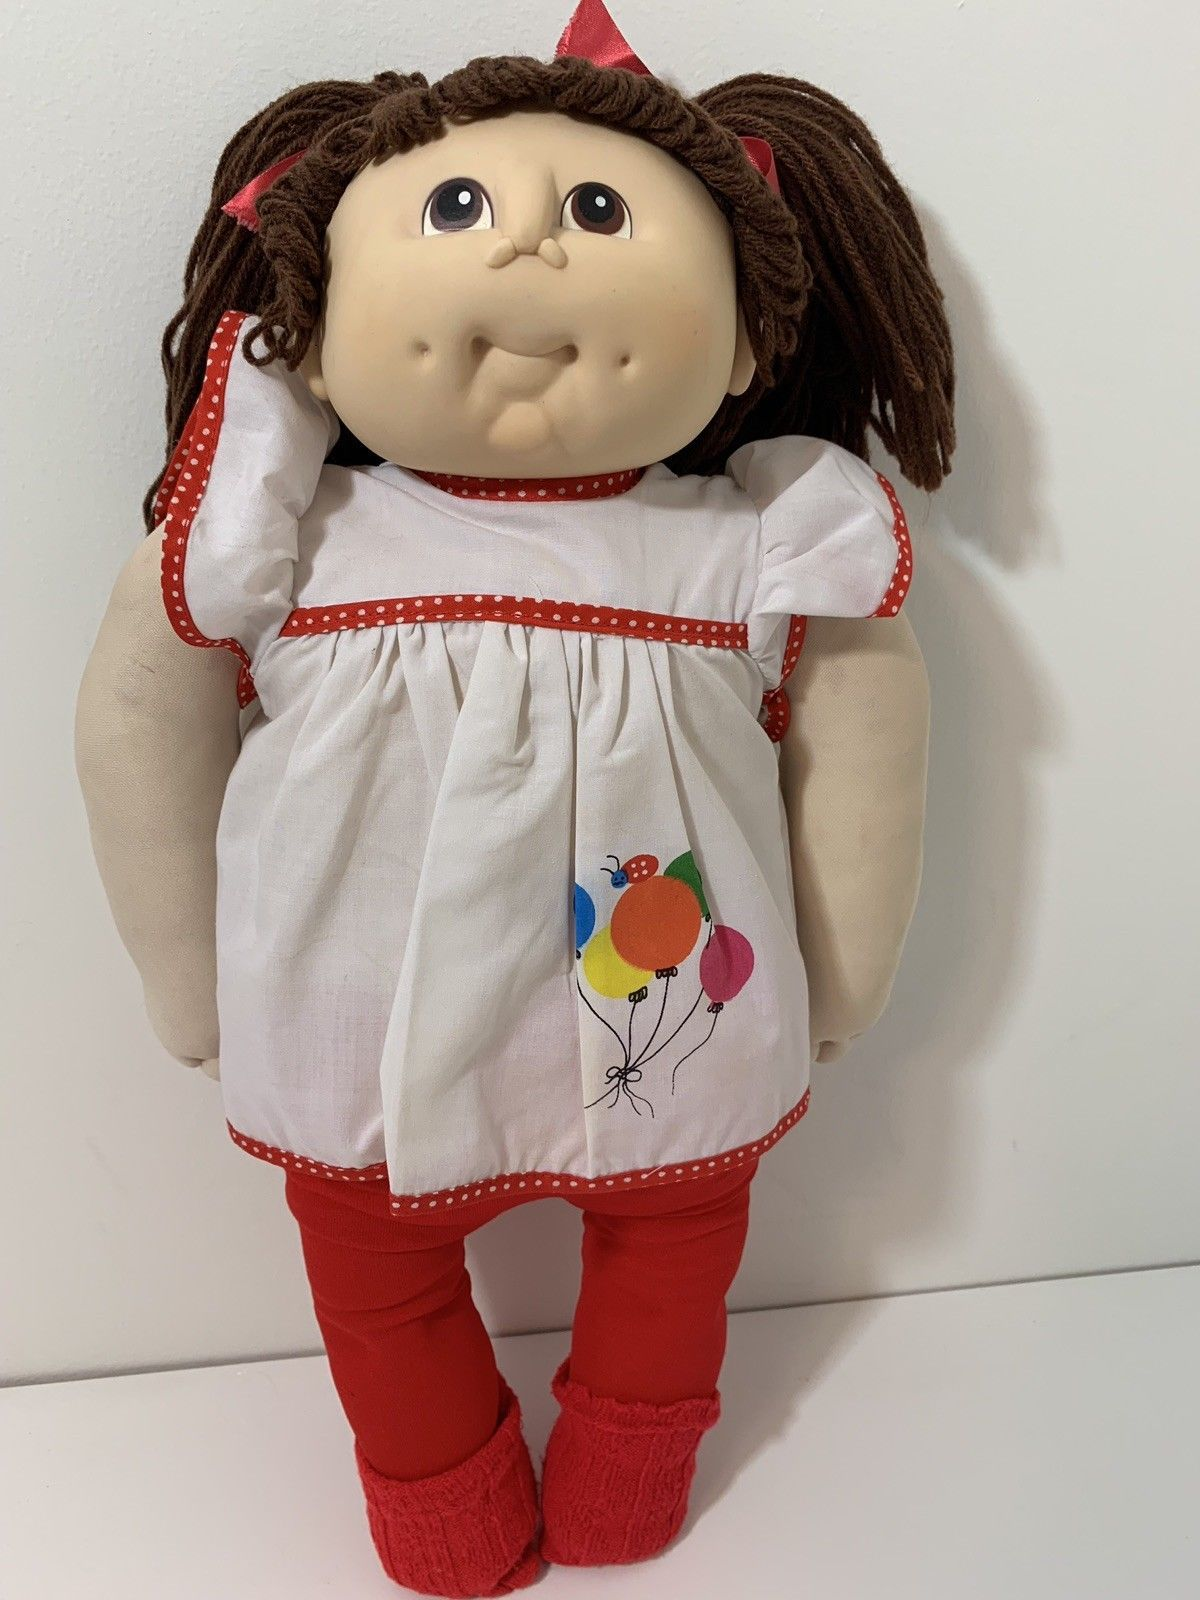 Pin on antique dolls